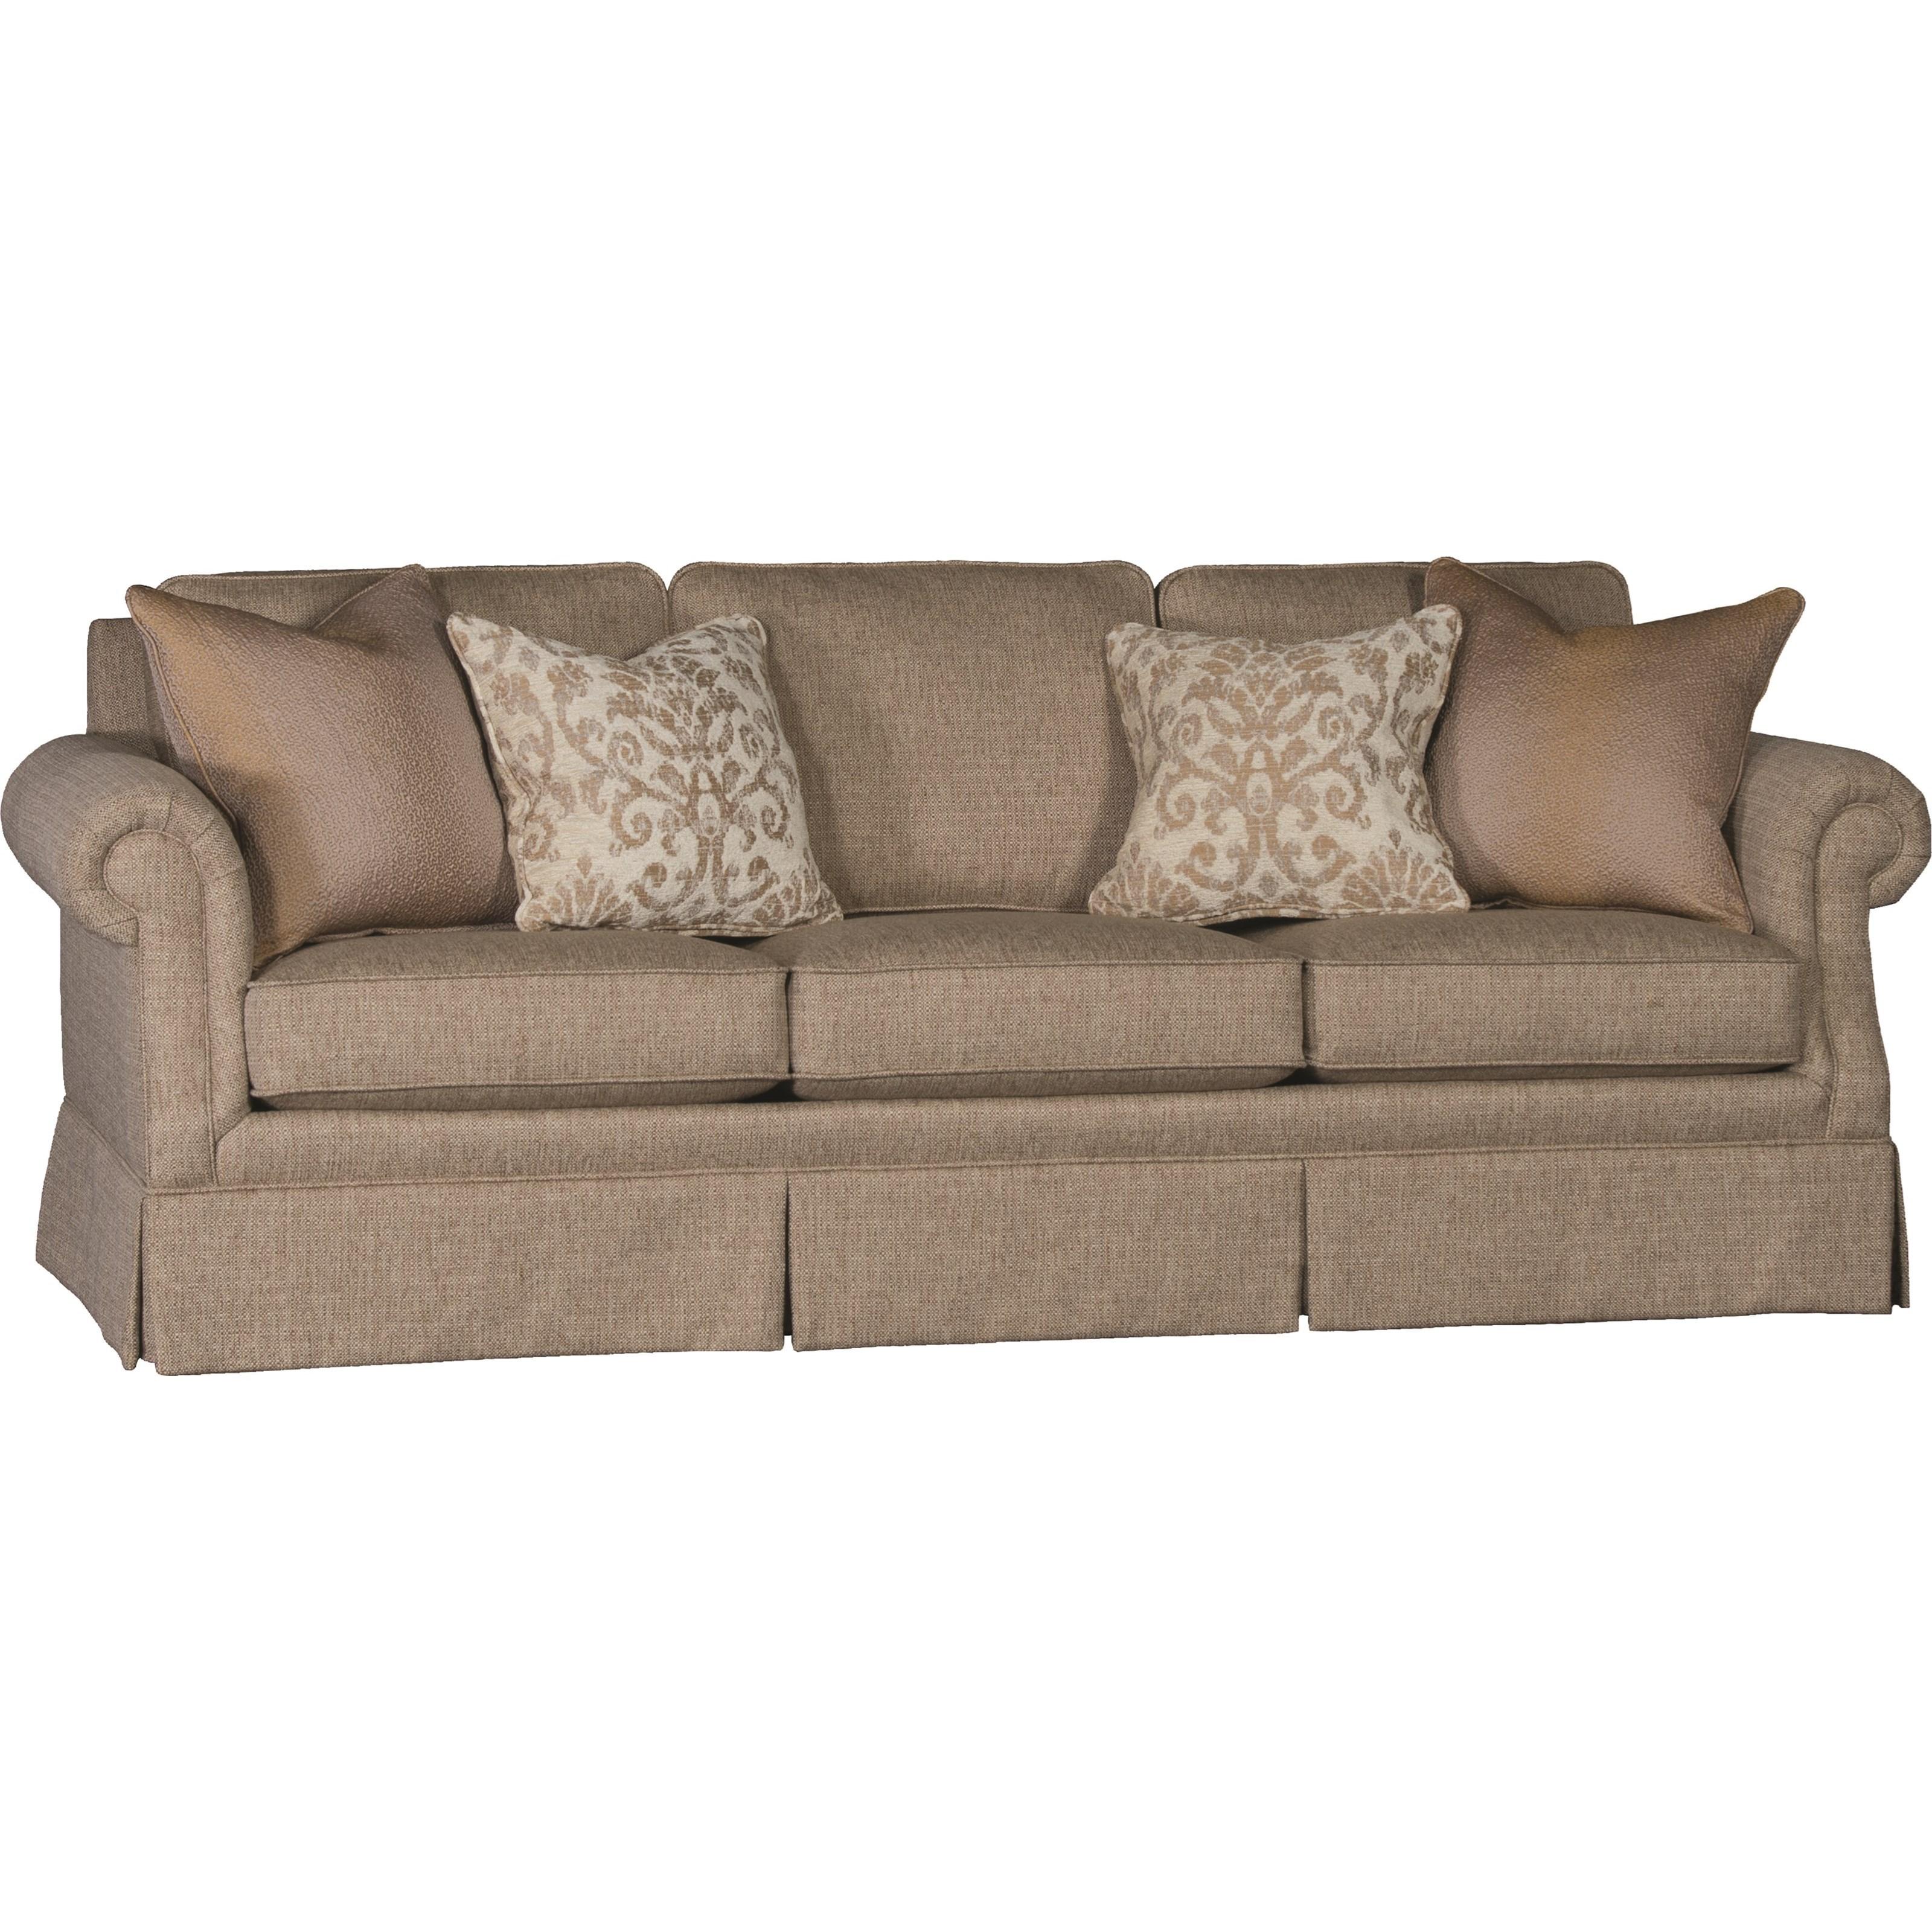 2600 Sofa by Mayo at Story & Lee Furniture